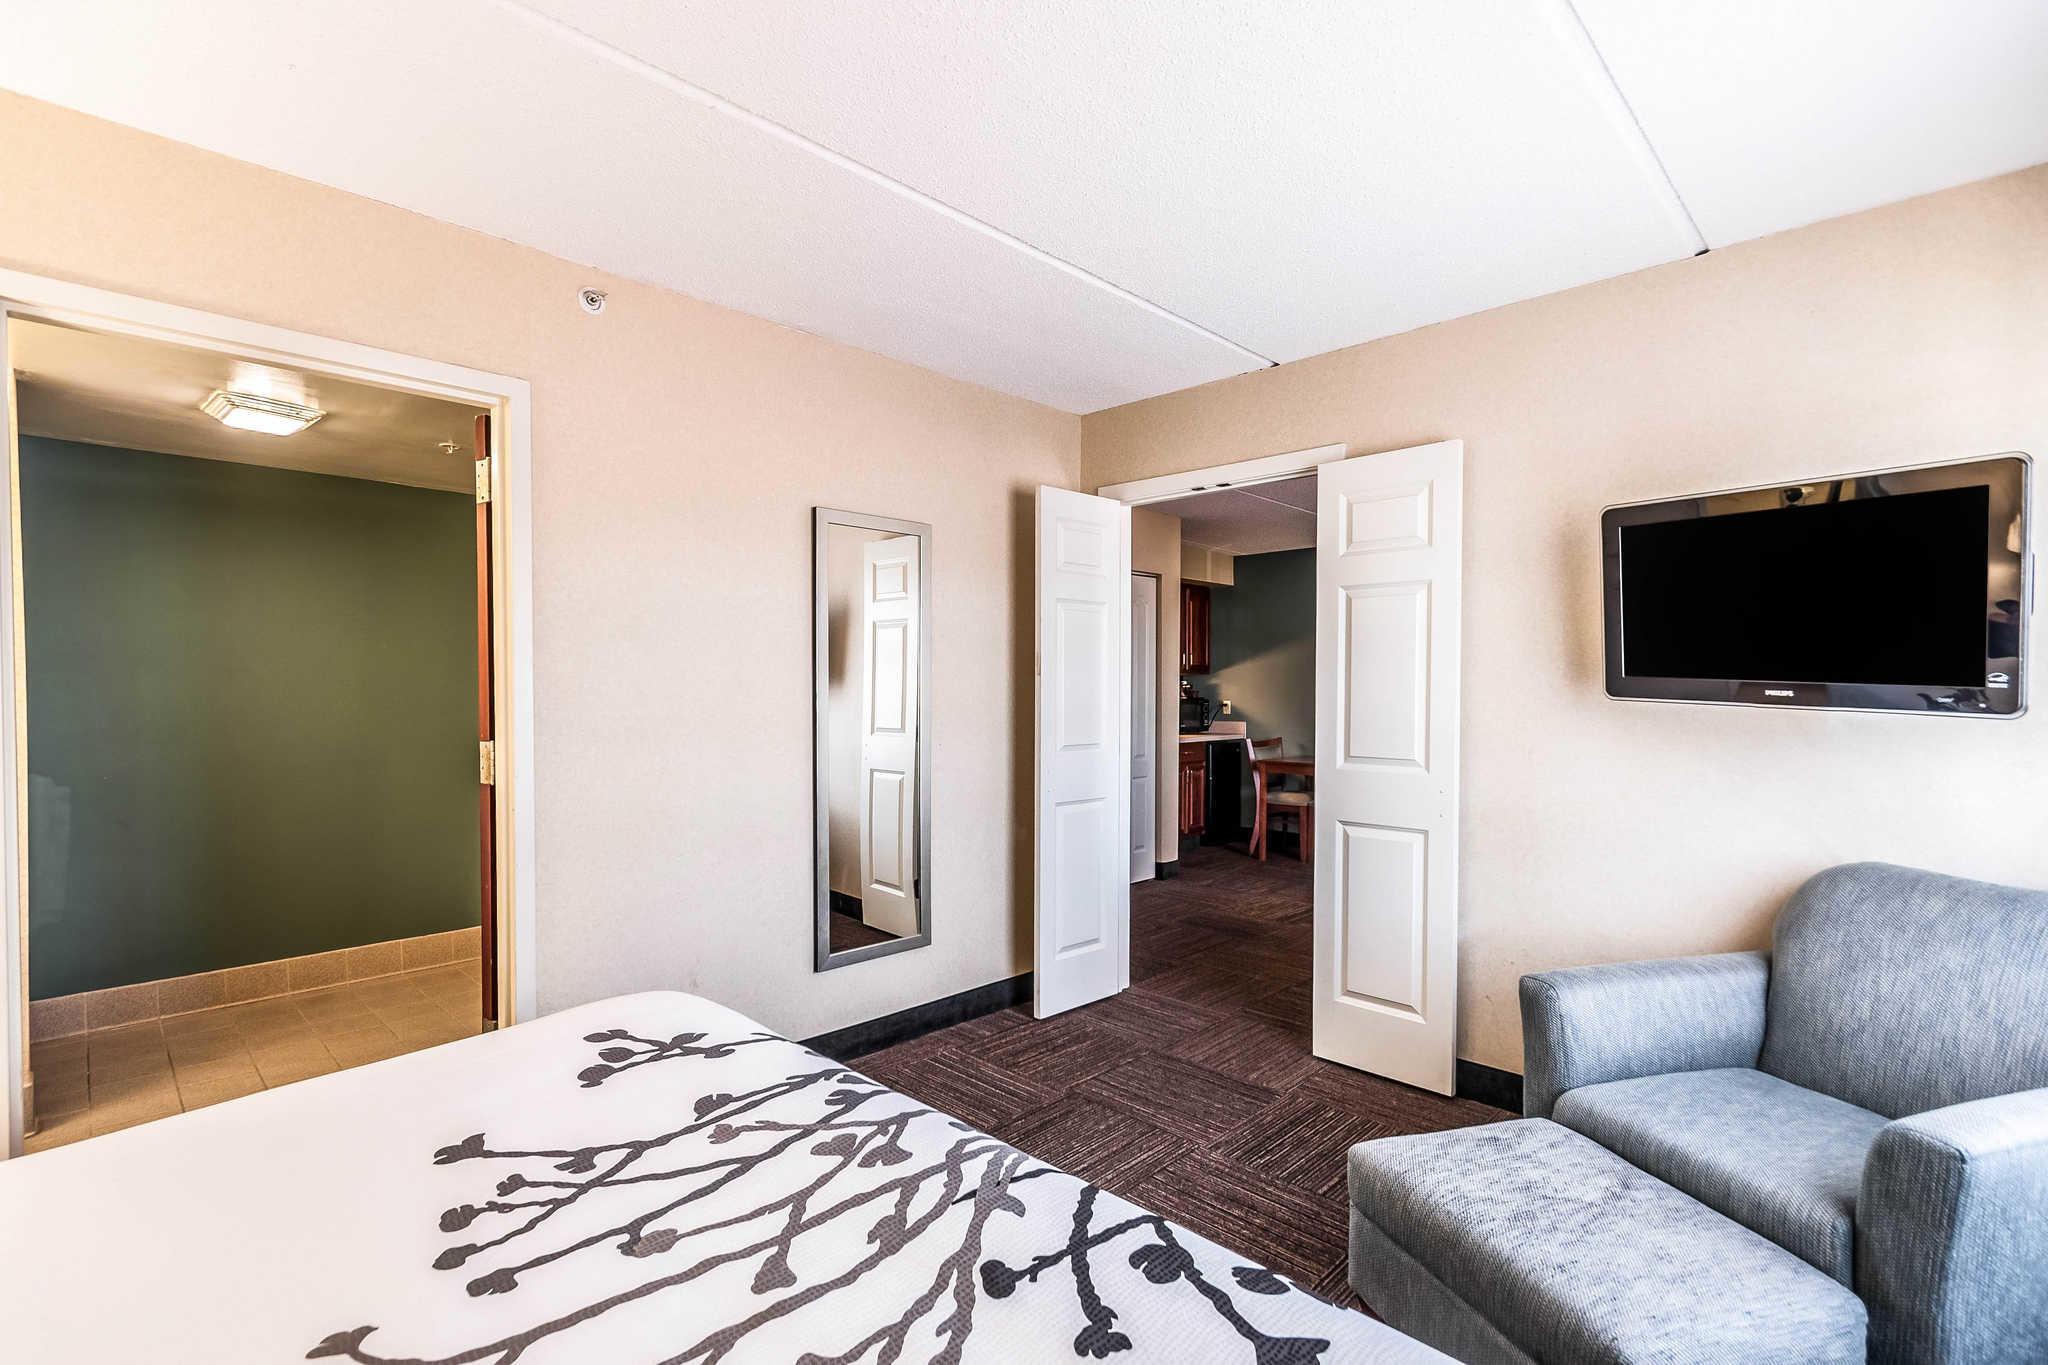 Sleep Inn & Suites Rehoboth Beach image 27